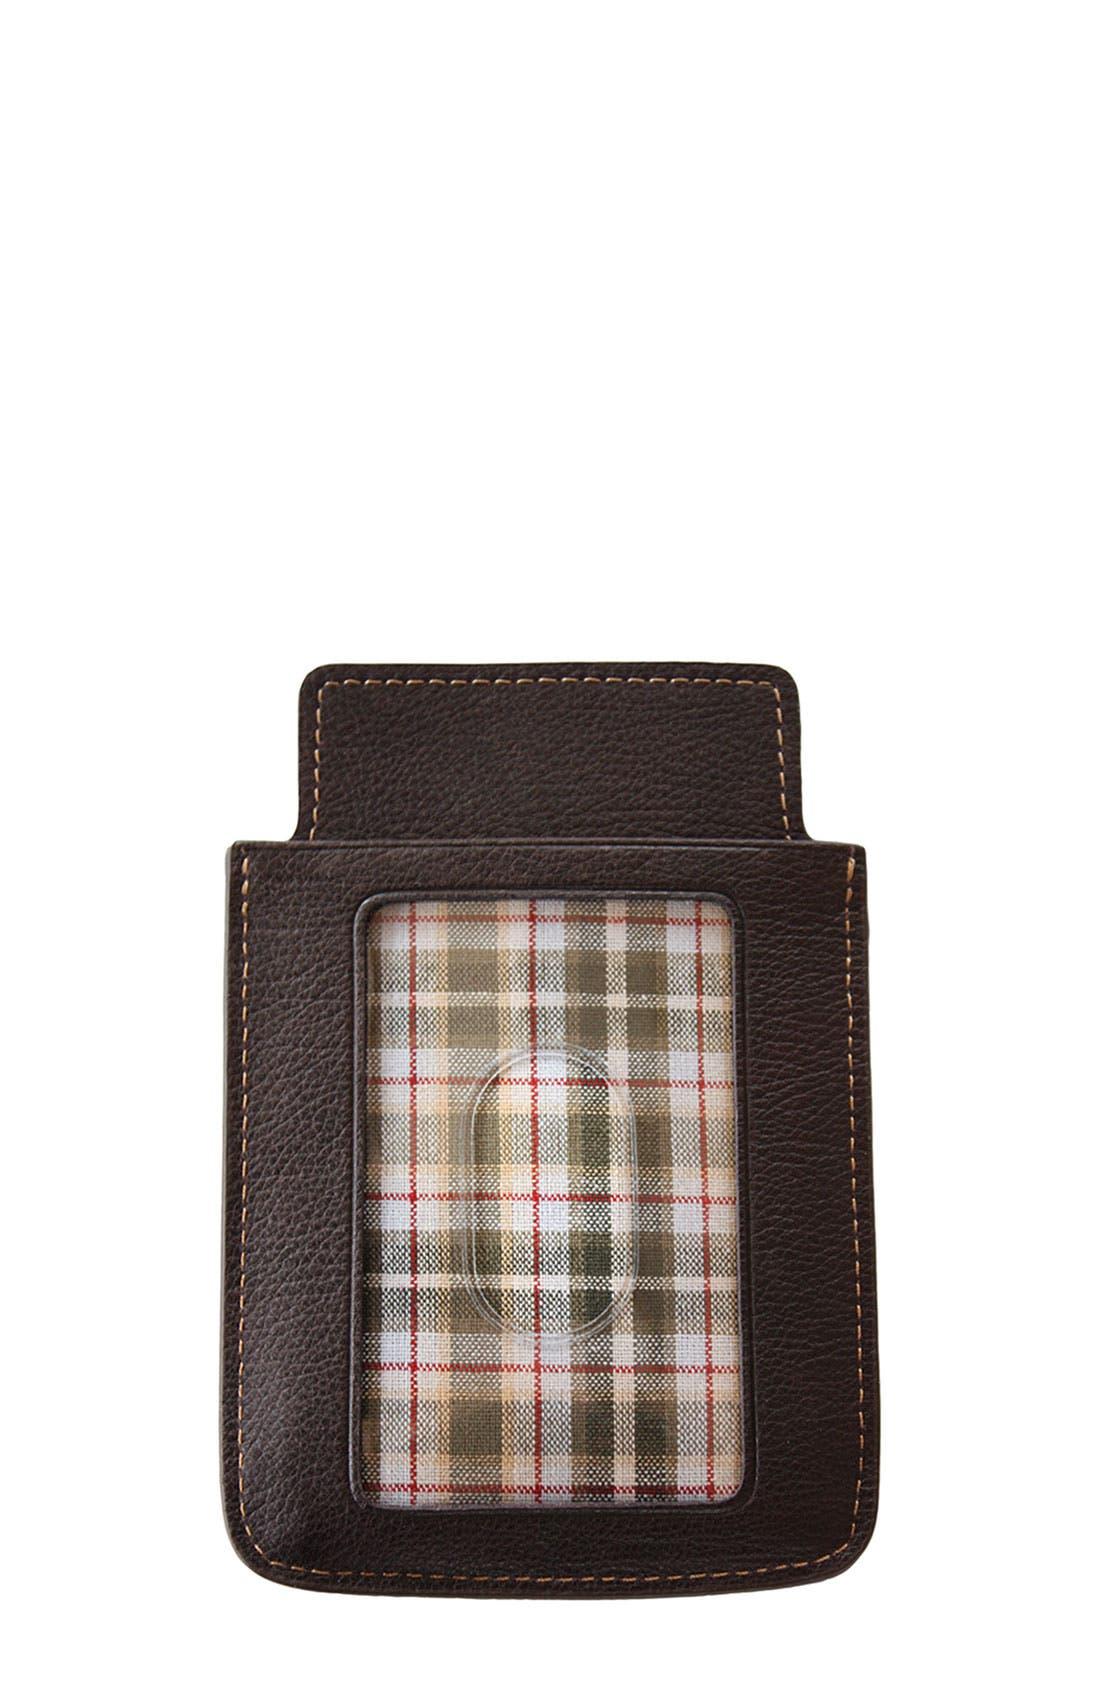 Main Image - Boconi 'iSheath' Smartphone Case